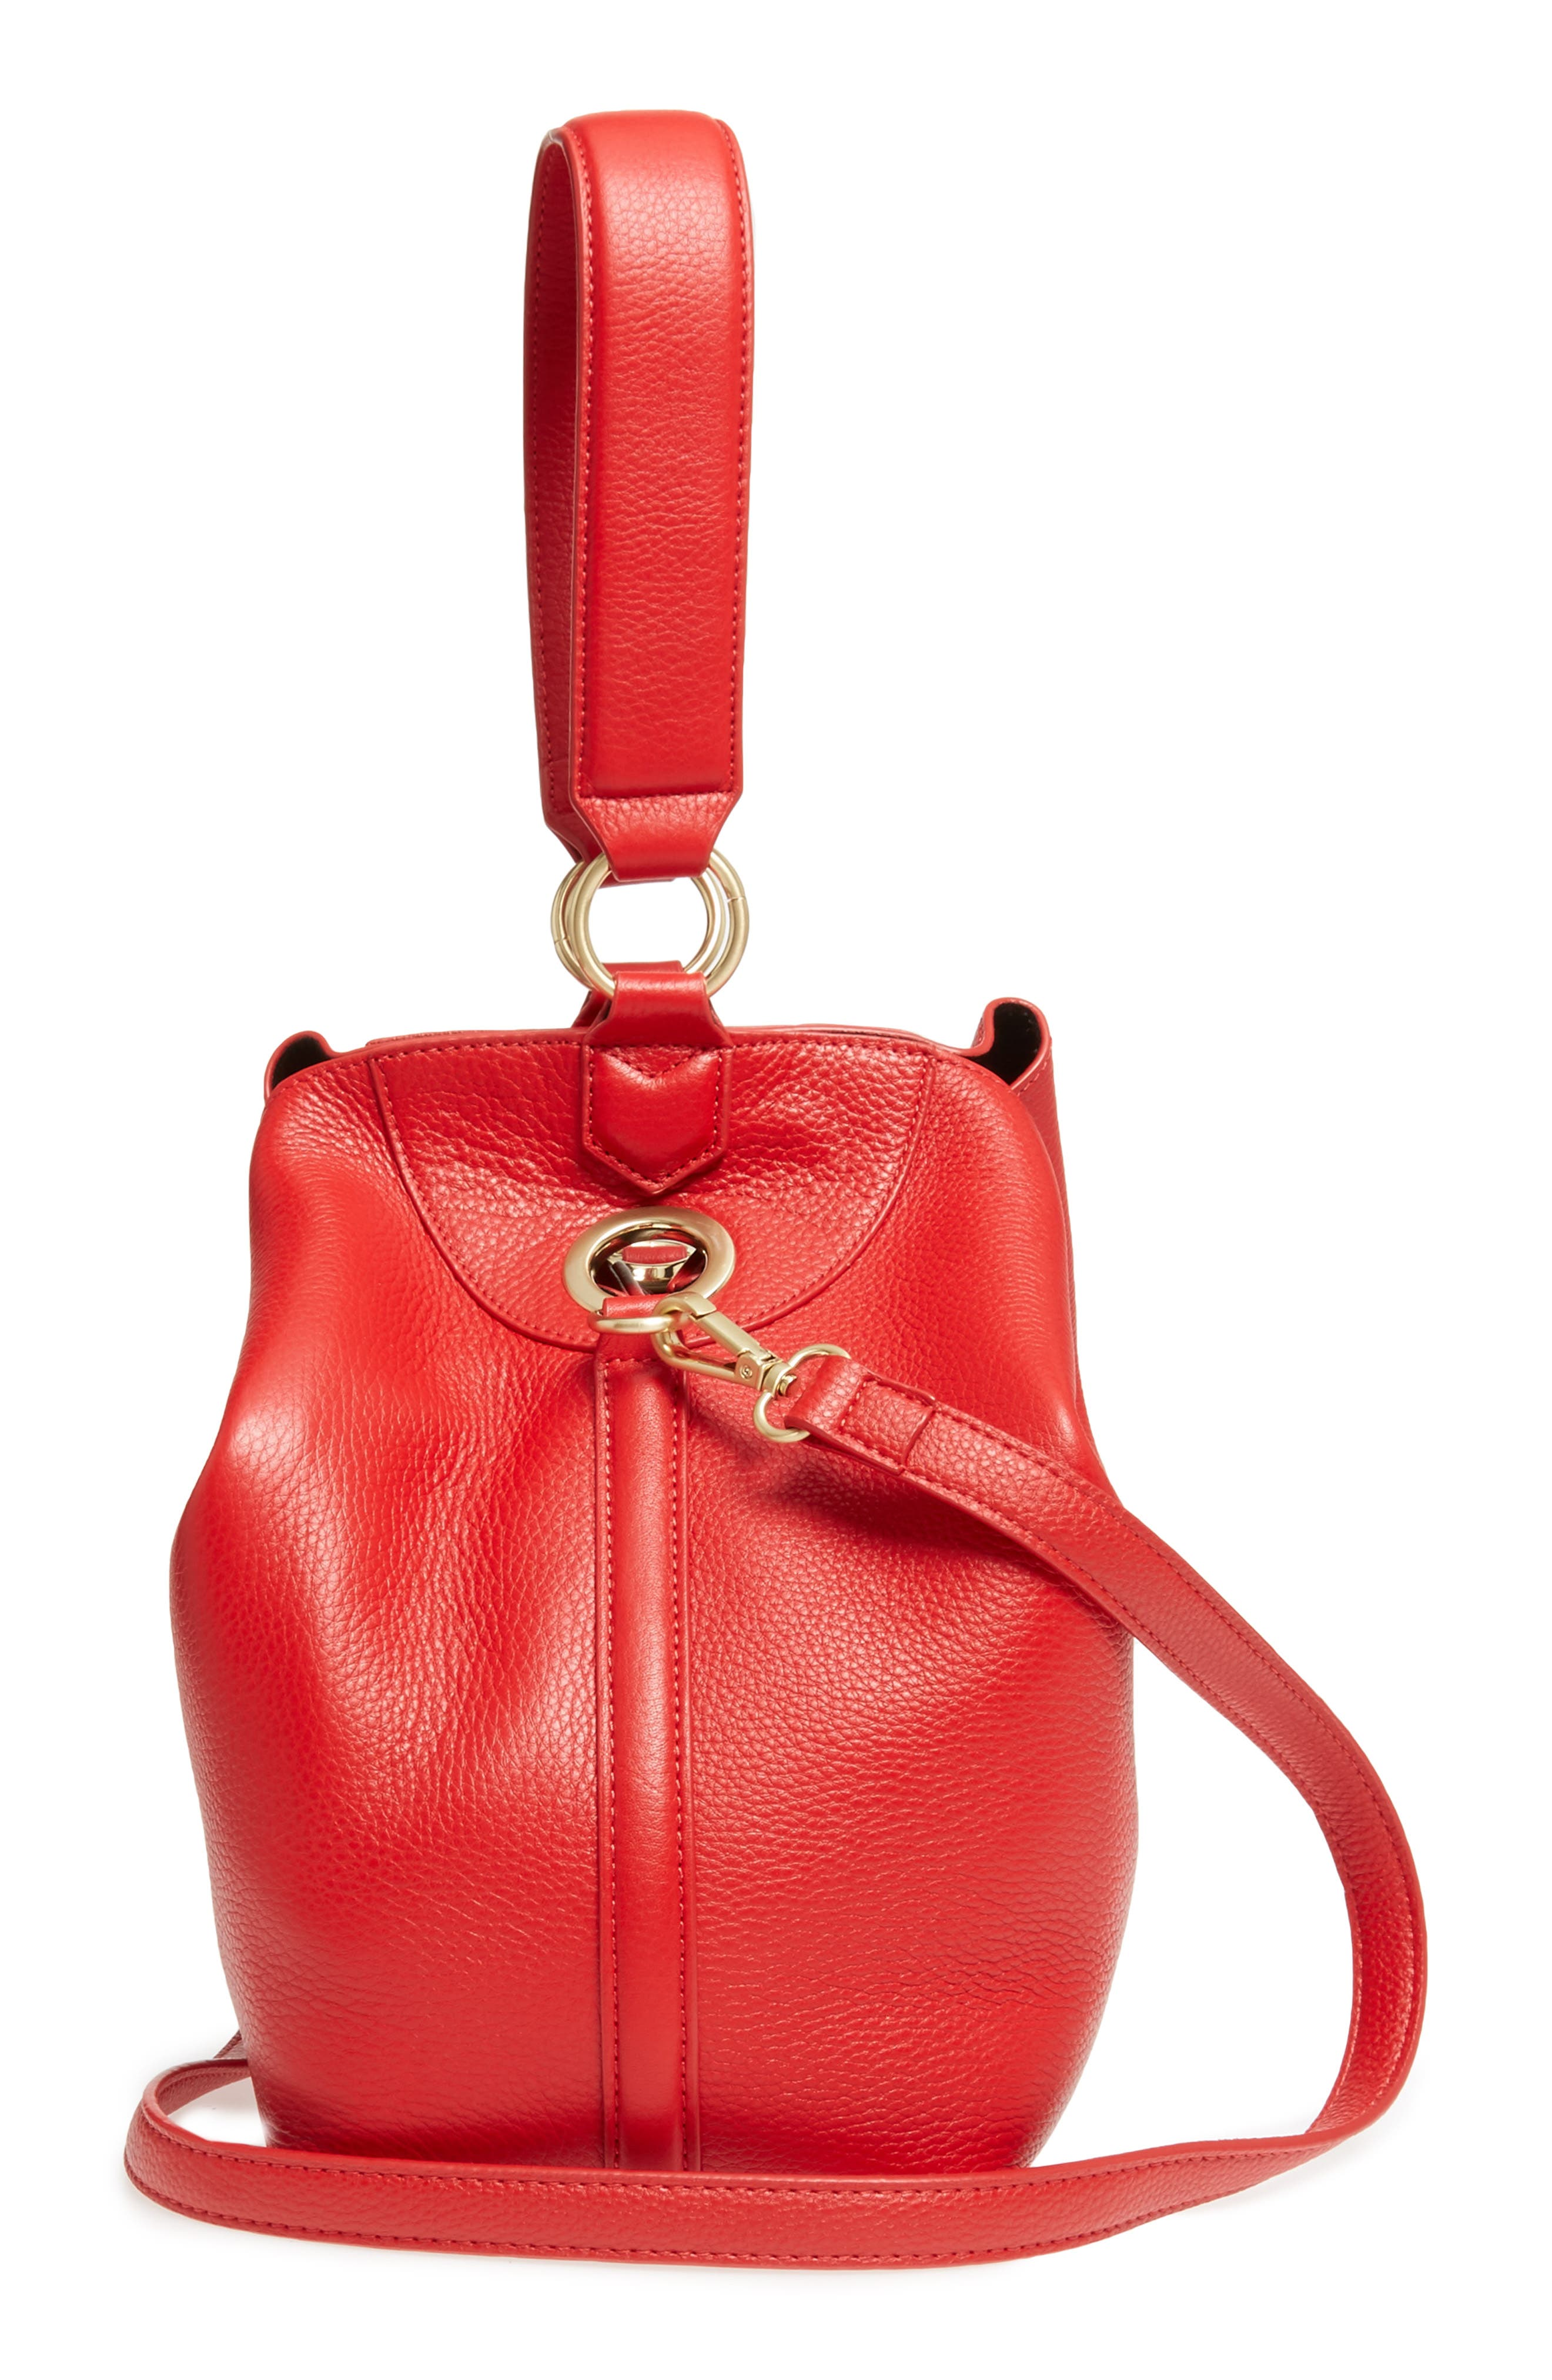 Sam Edelman Renee Leather Bucket Bag